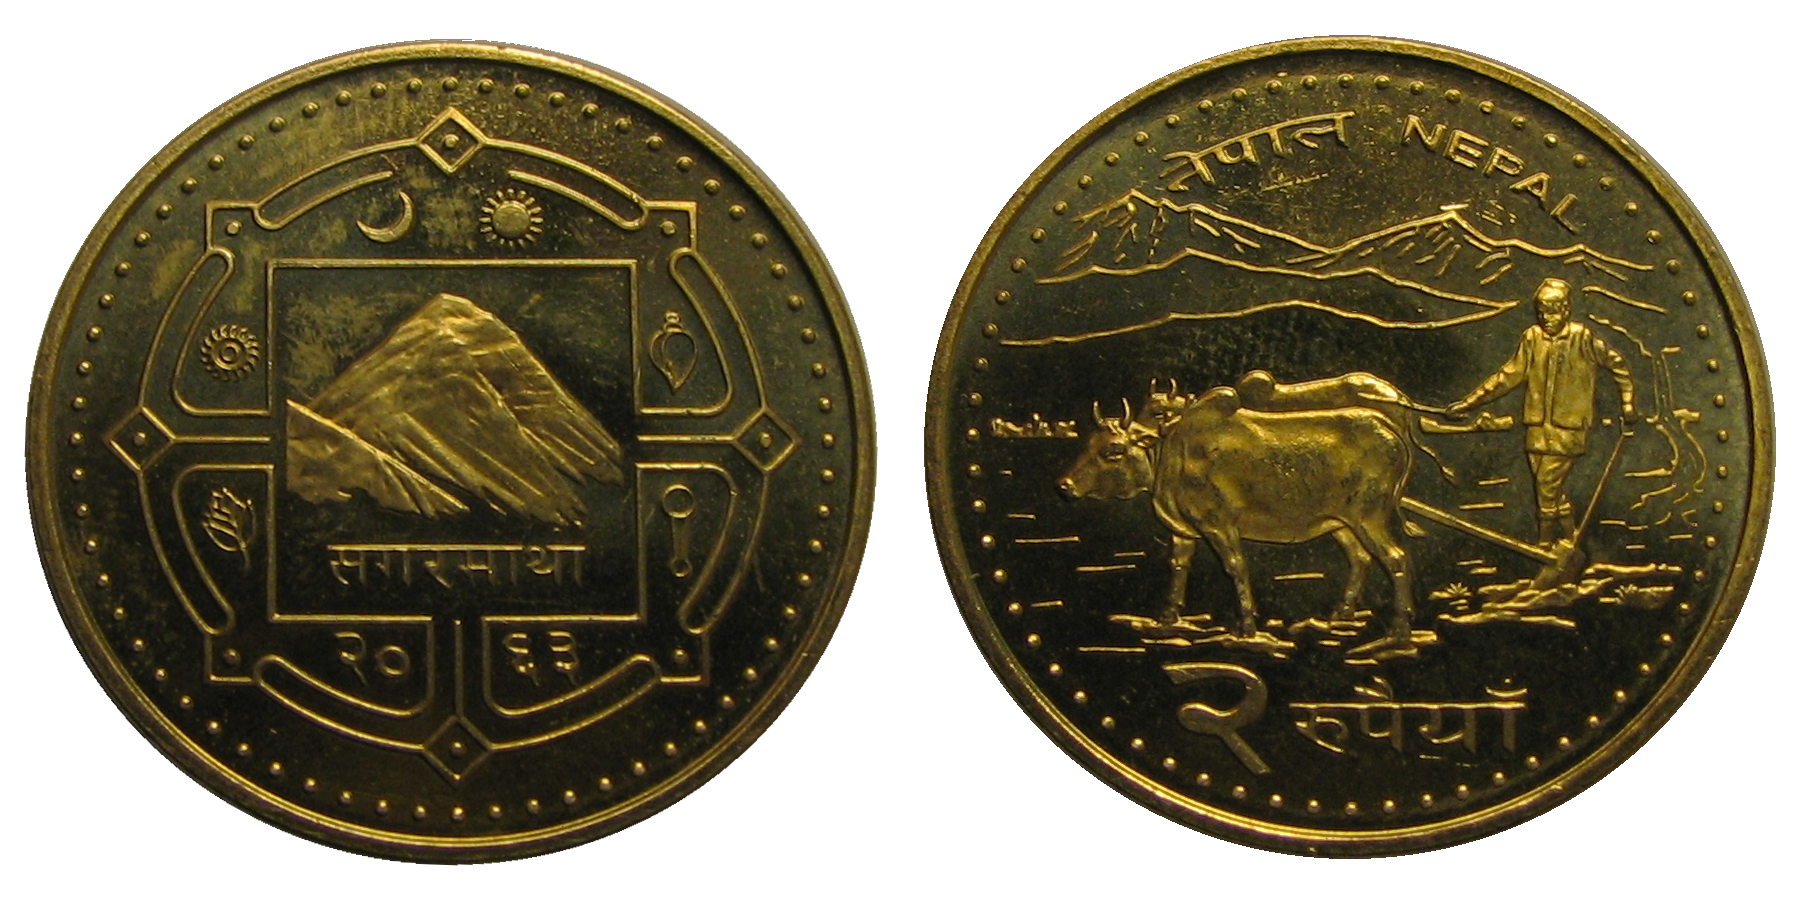 Convertit Bitcoin Free Cash La Seychelles rupee